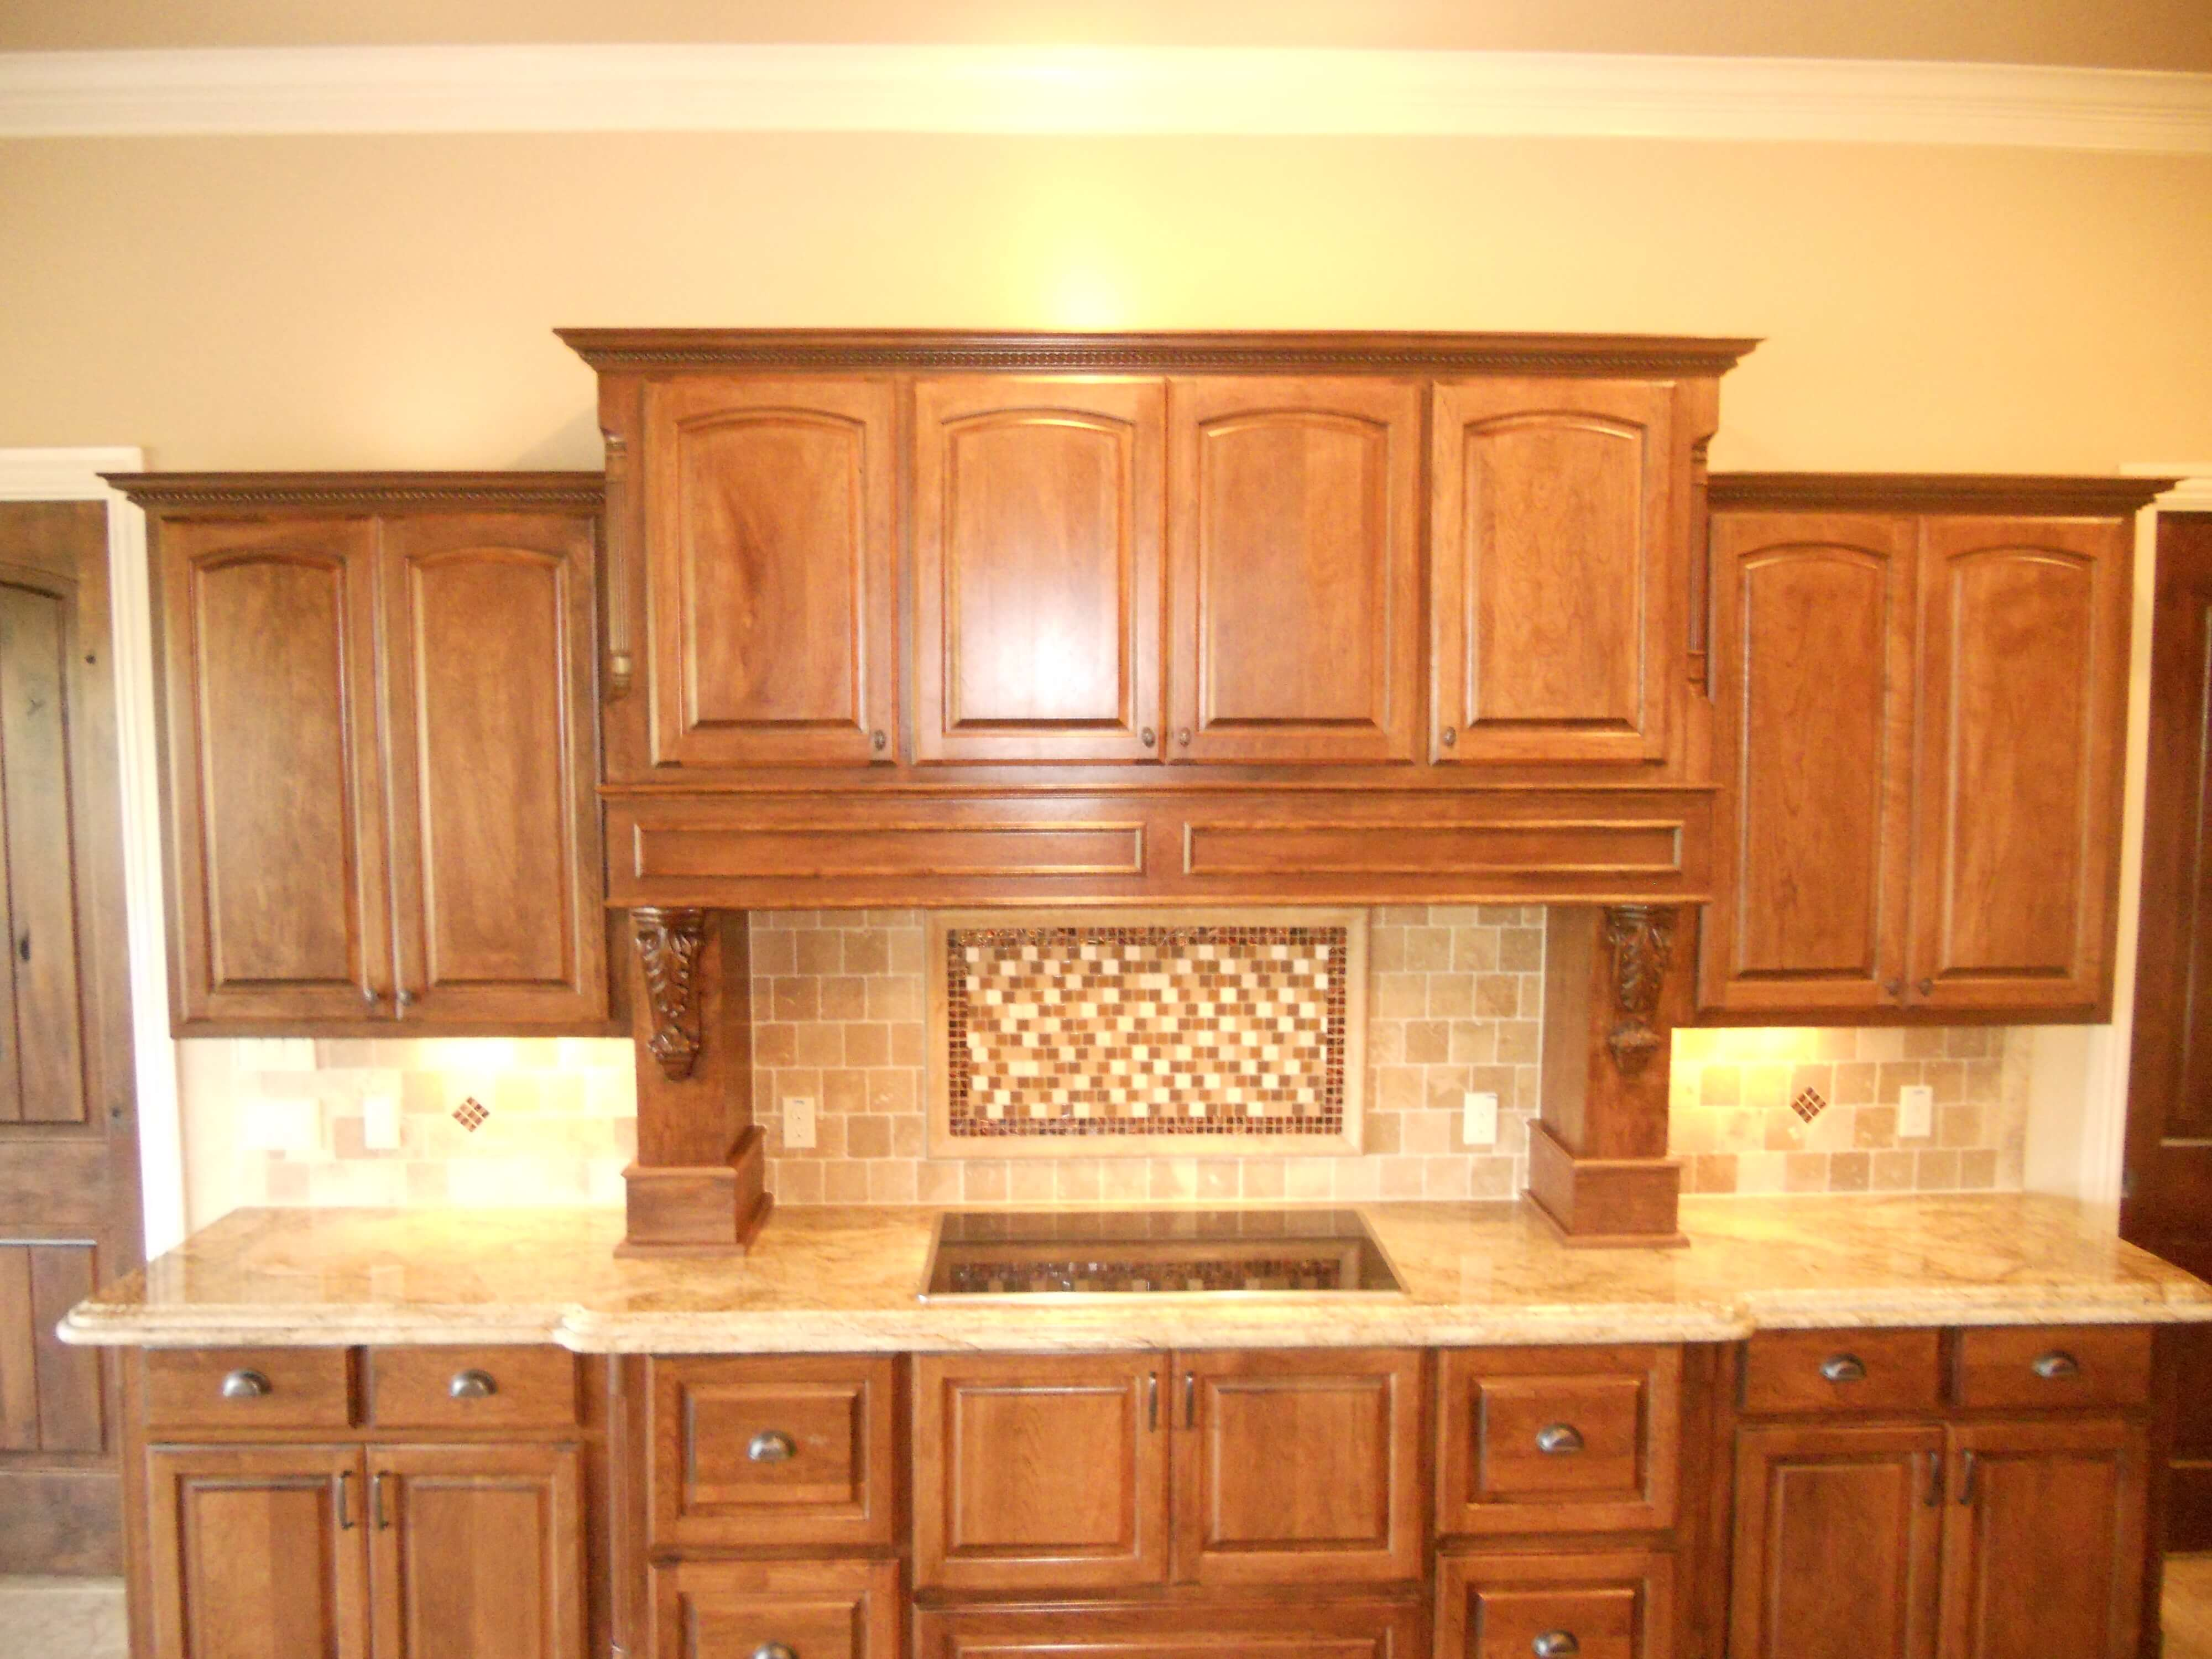 custom island kitchen built by JB Murphy Co